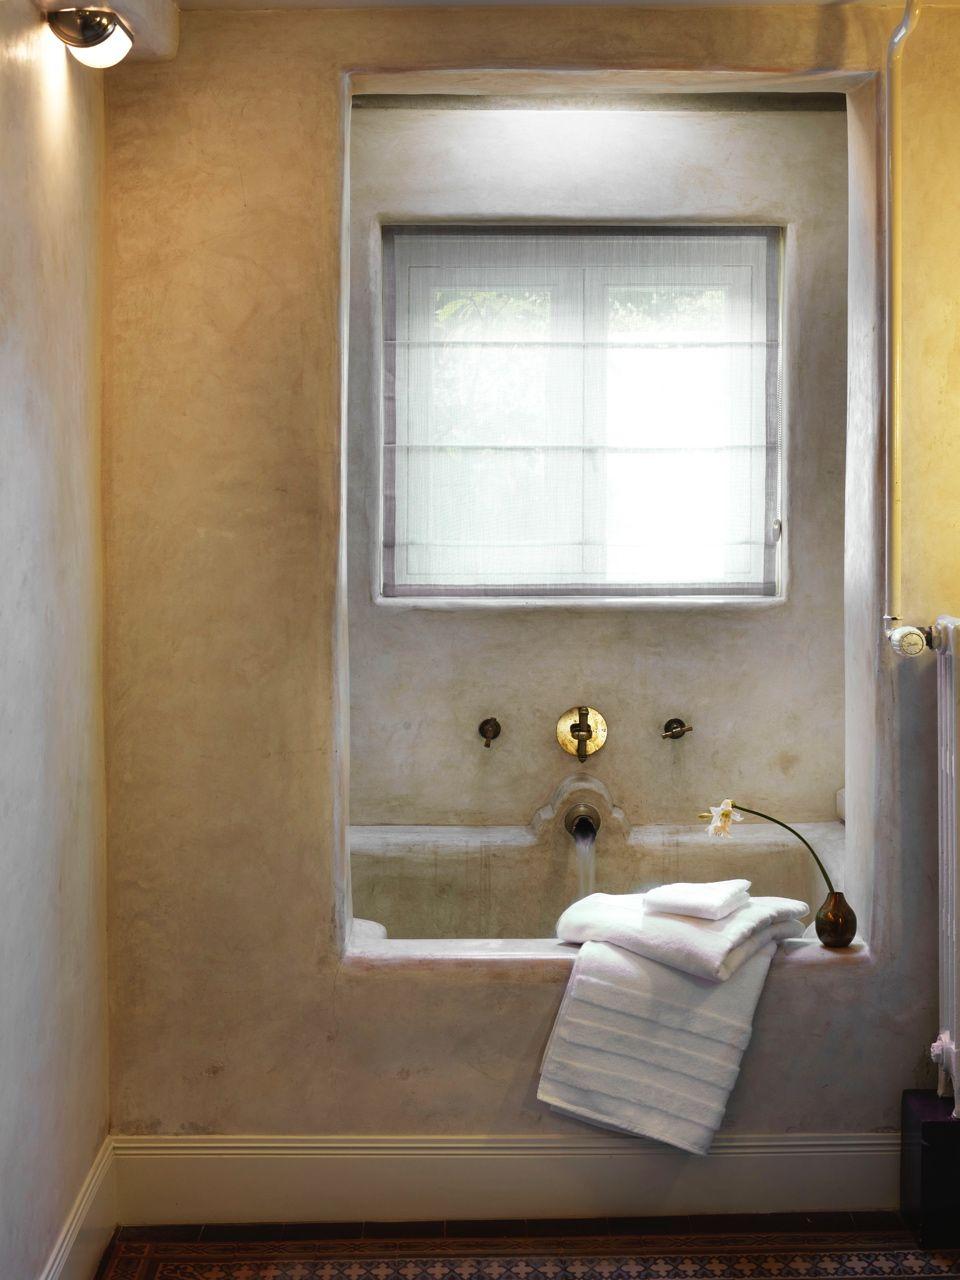 Villa Nicola | Villa Nicola Amsterdam I Photography by Frank Brandwijk I Styling Anja Koops I Garden Suite Bathroom B&B 03